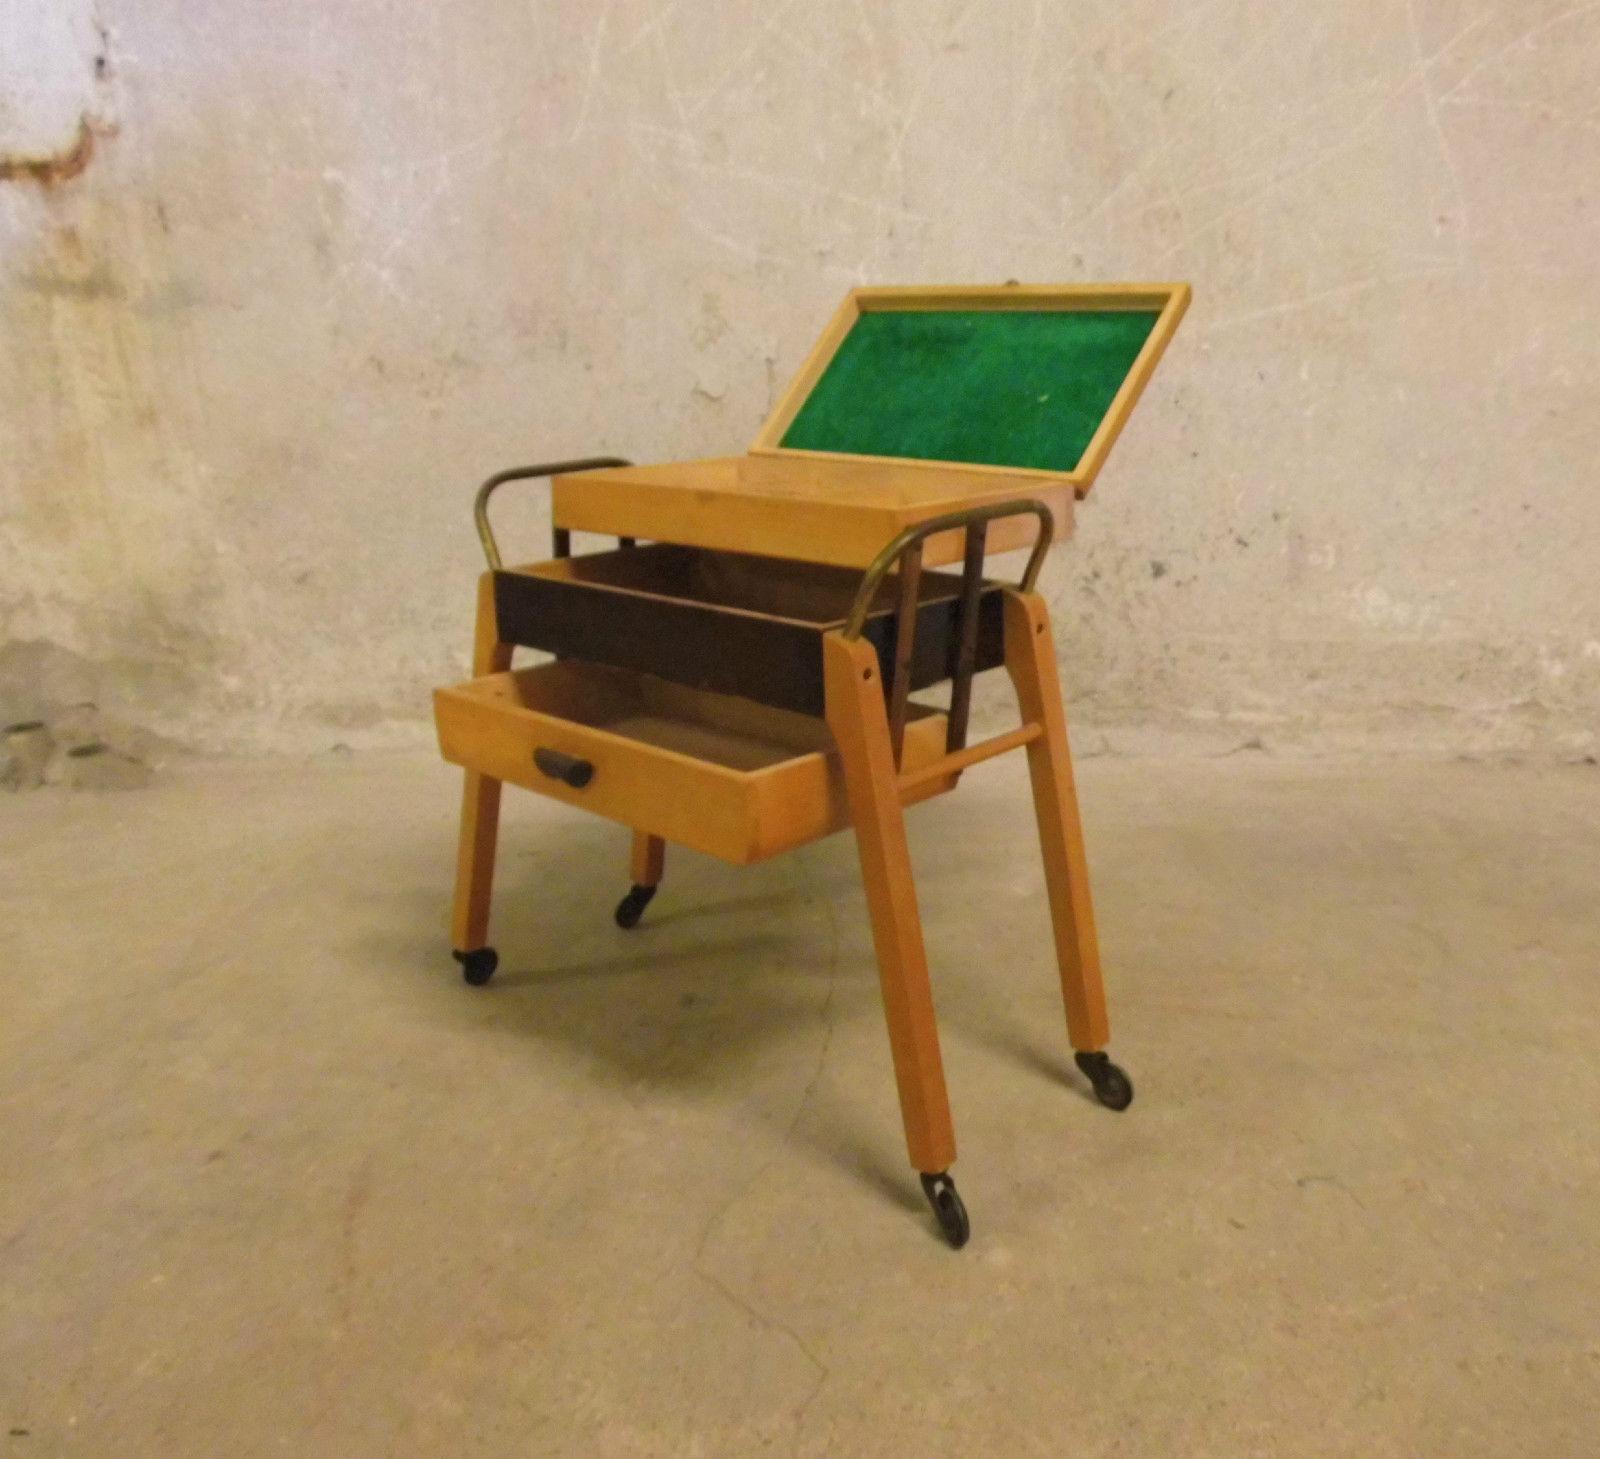 Area dise o vintage mueble auxiliar dise o a os 50 - Mueble anos 50 ...